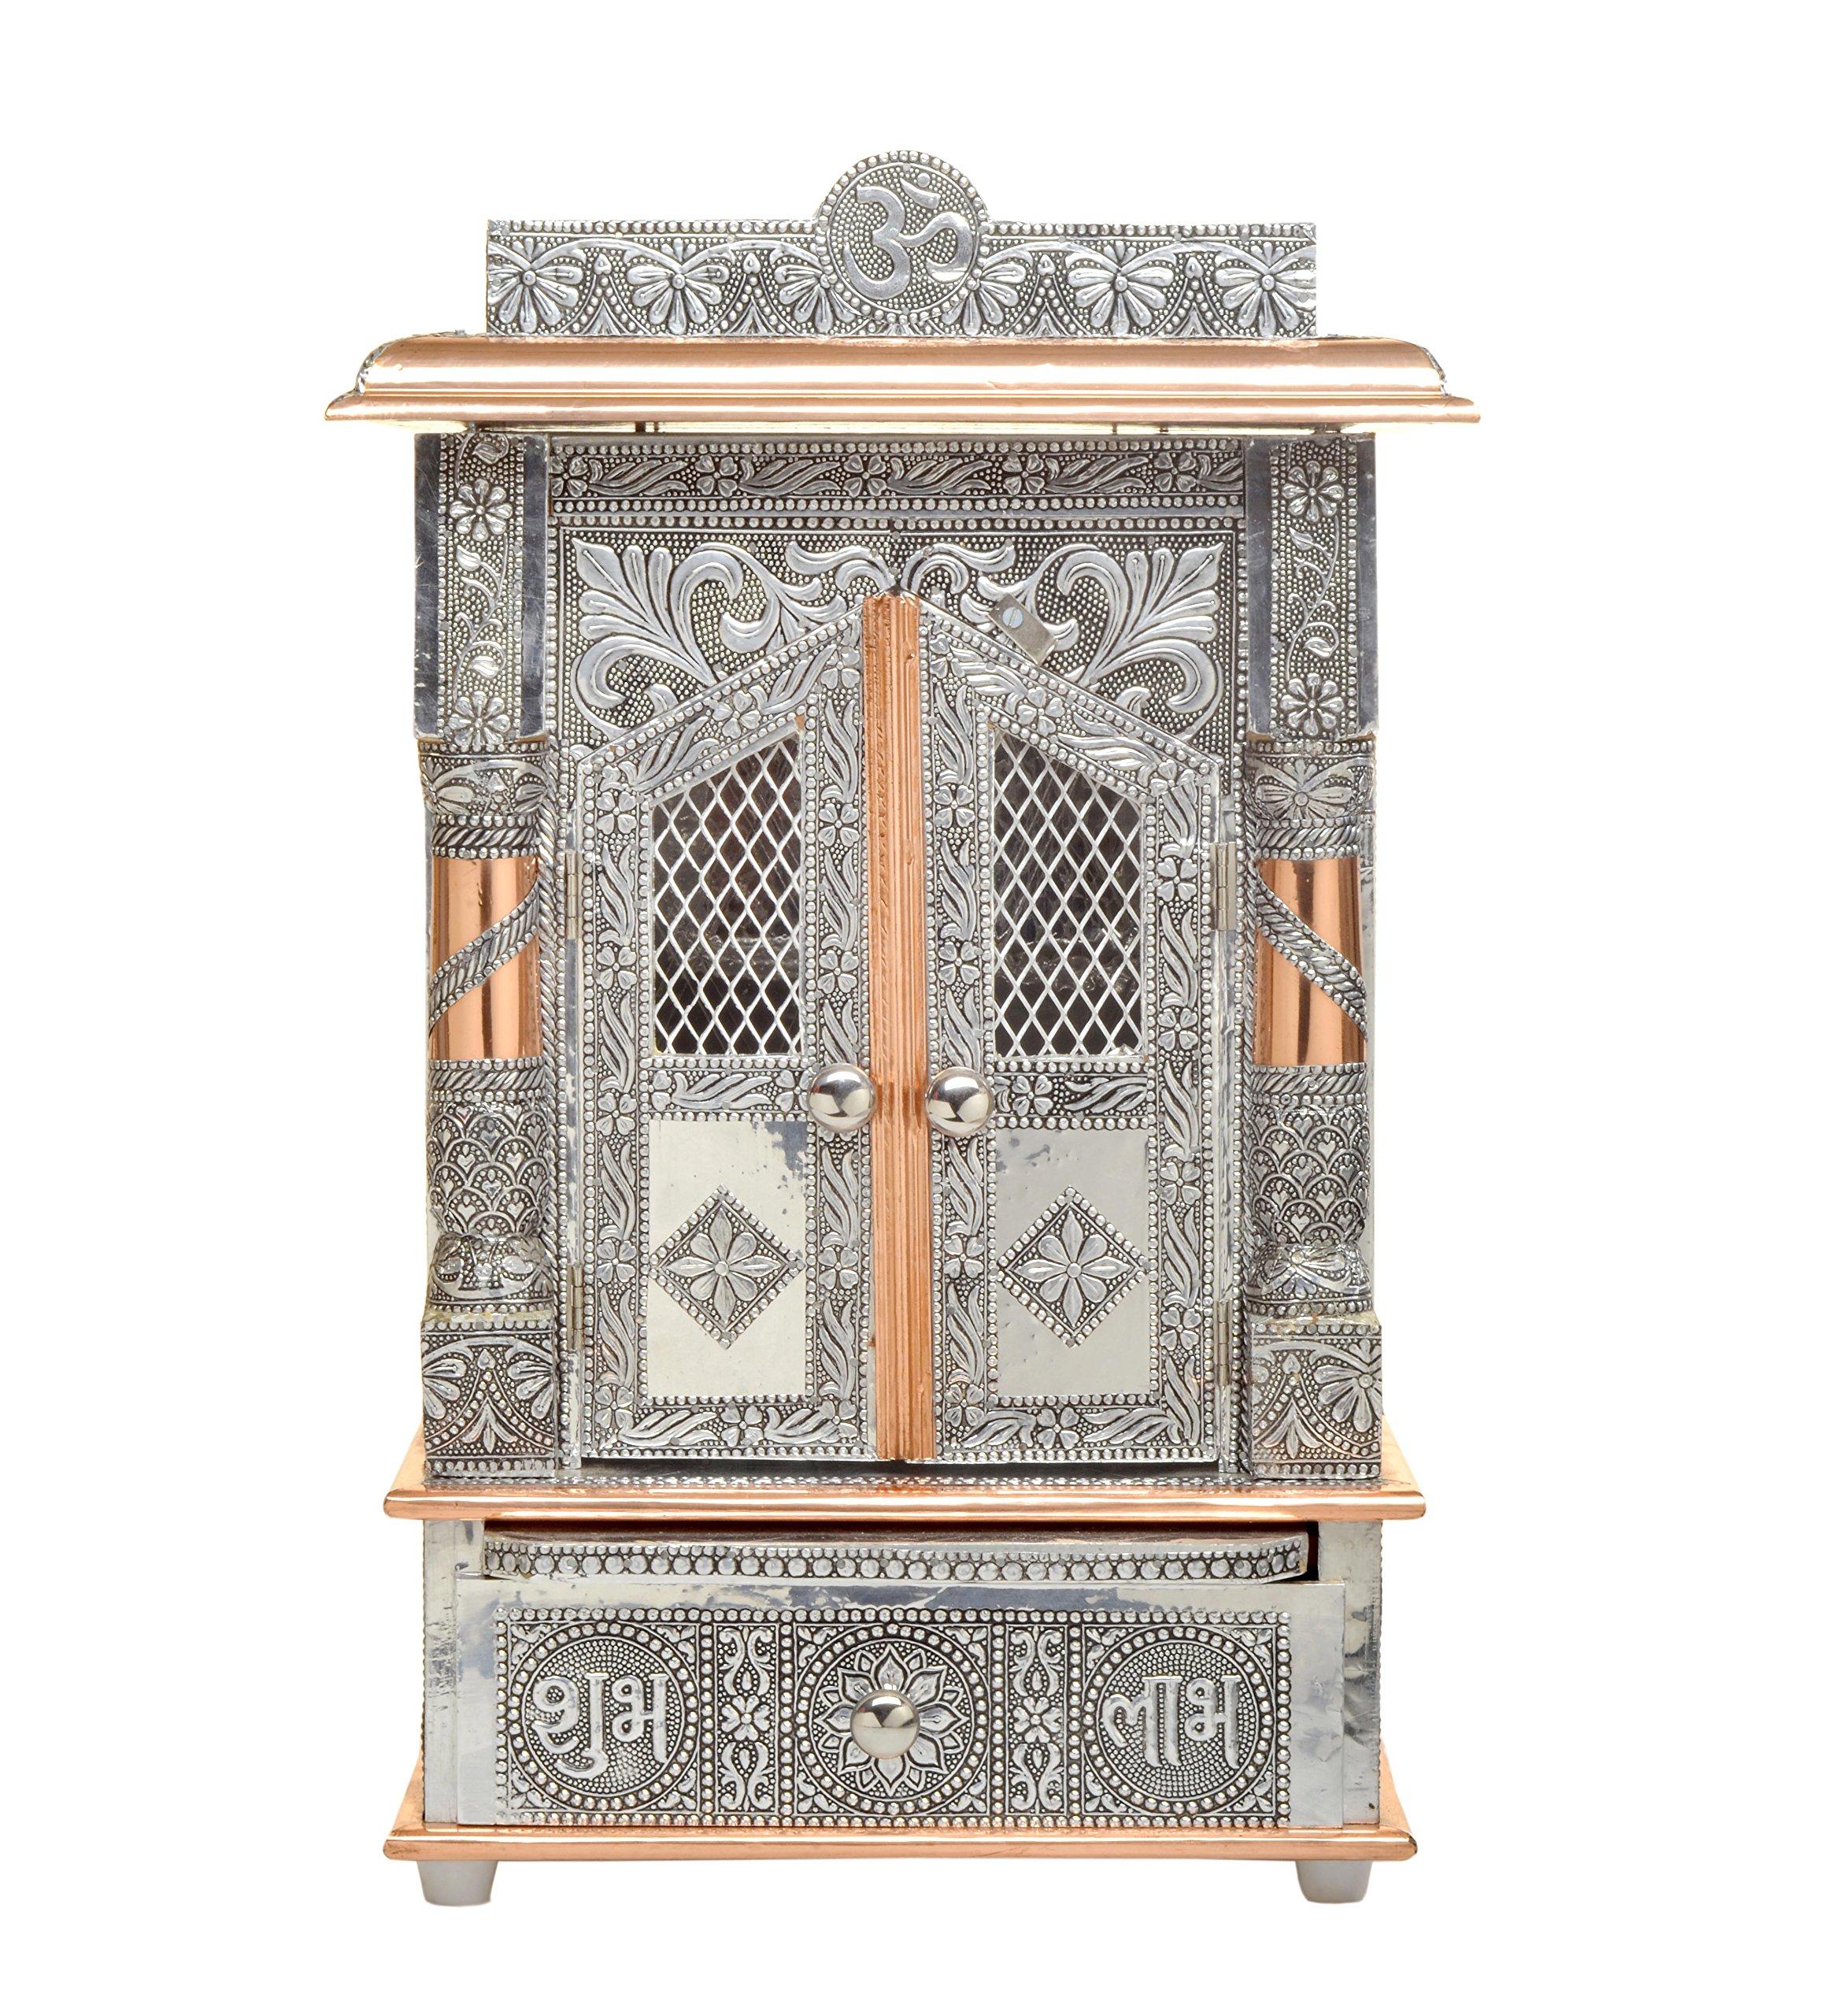 Movie Time Vdieo 59069-DS Hindu Puja Mandir/Temple/Alter, Aluminum Plated with Doors